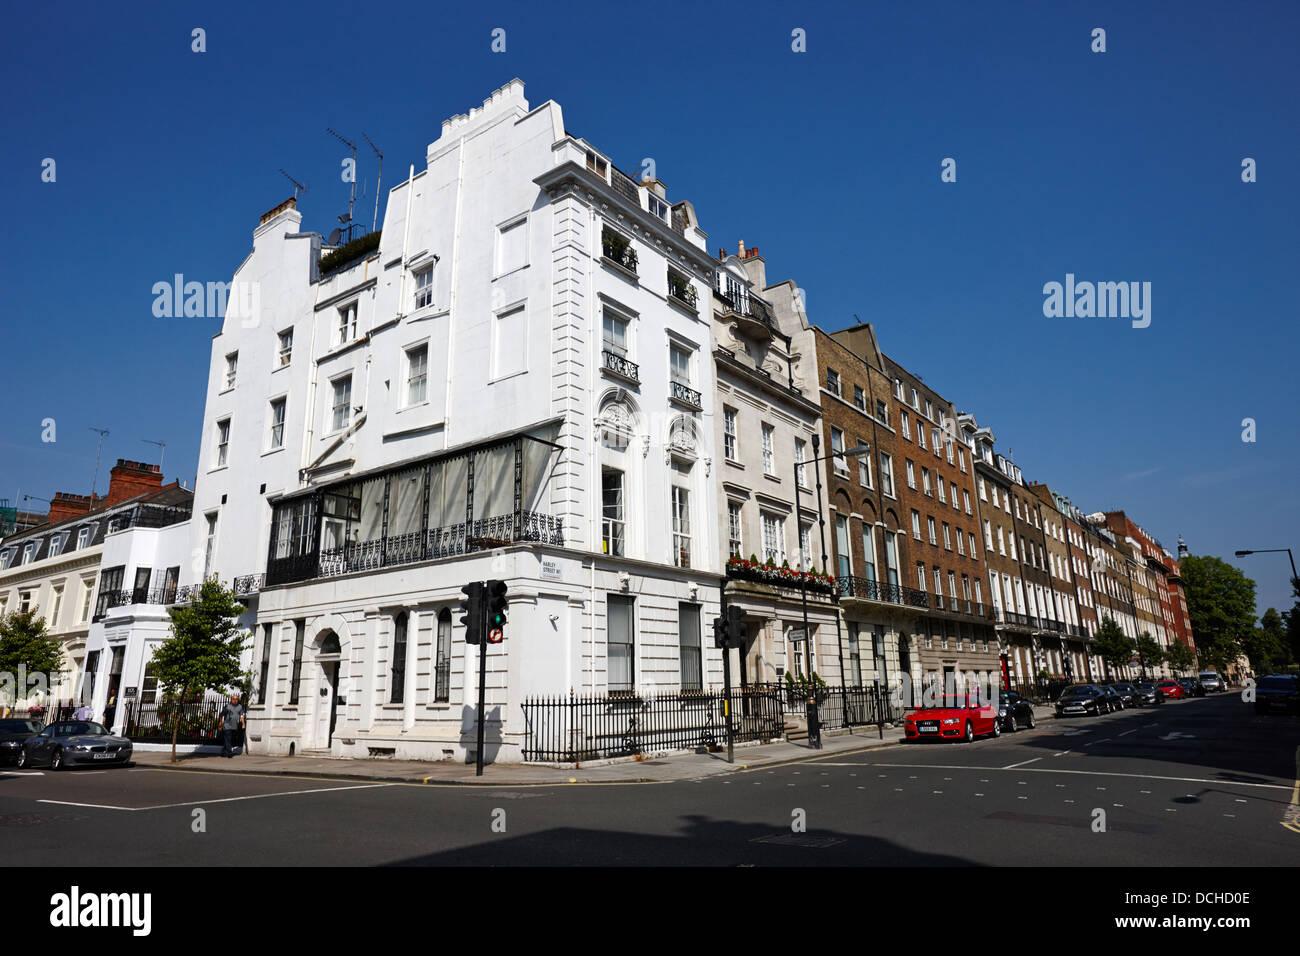 Vue générale de Harley Street London England UK Photo Stock